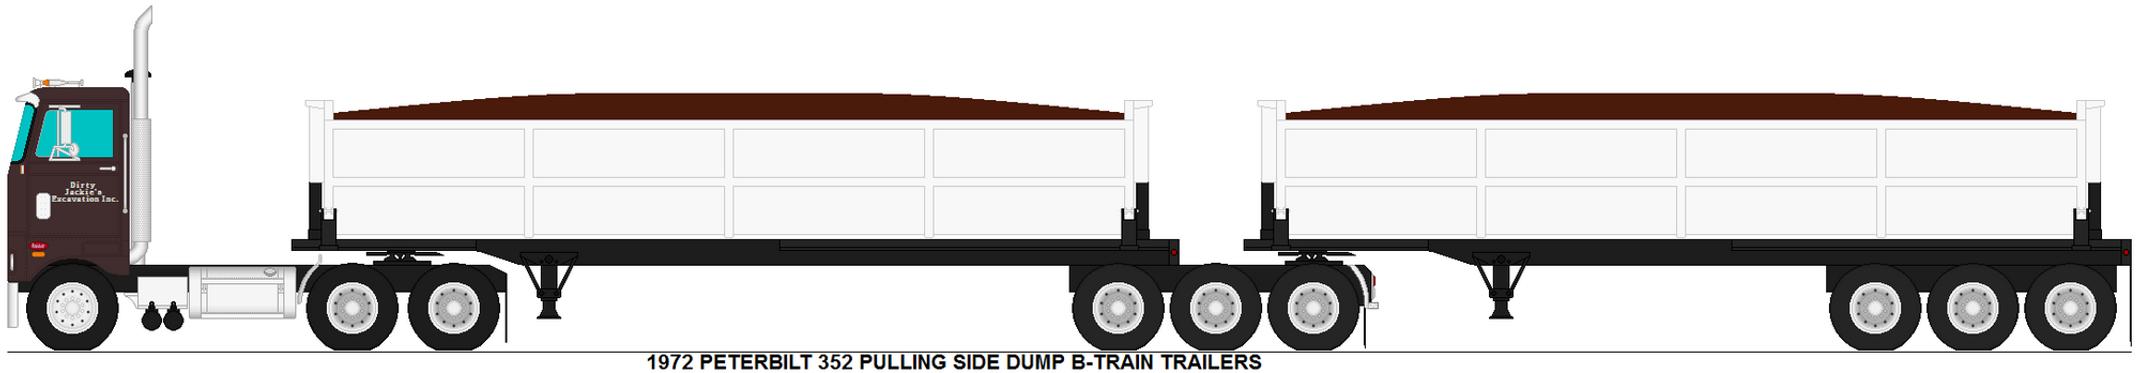 Peterbilt 352 Pulling Side Dump B Train Trailers By